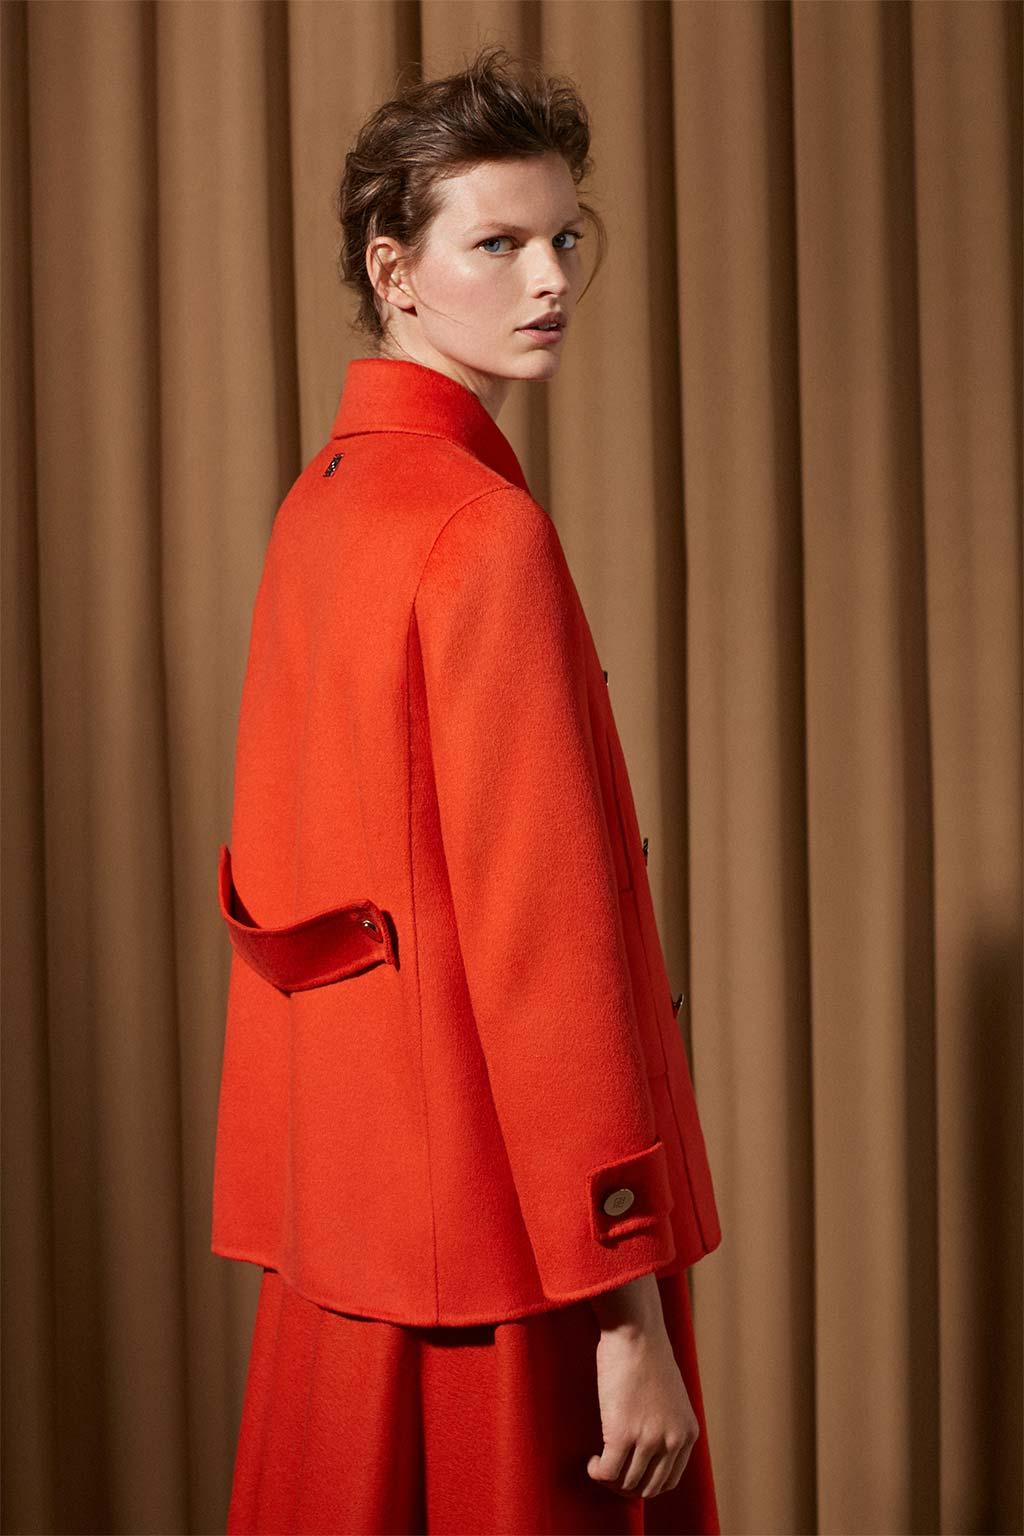 CH Carolina Herrera. New womenswear collection Spotlight. Look 06